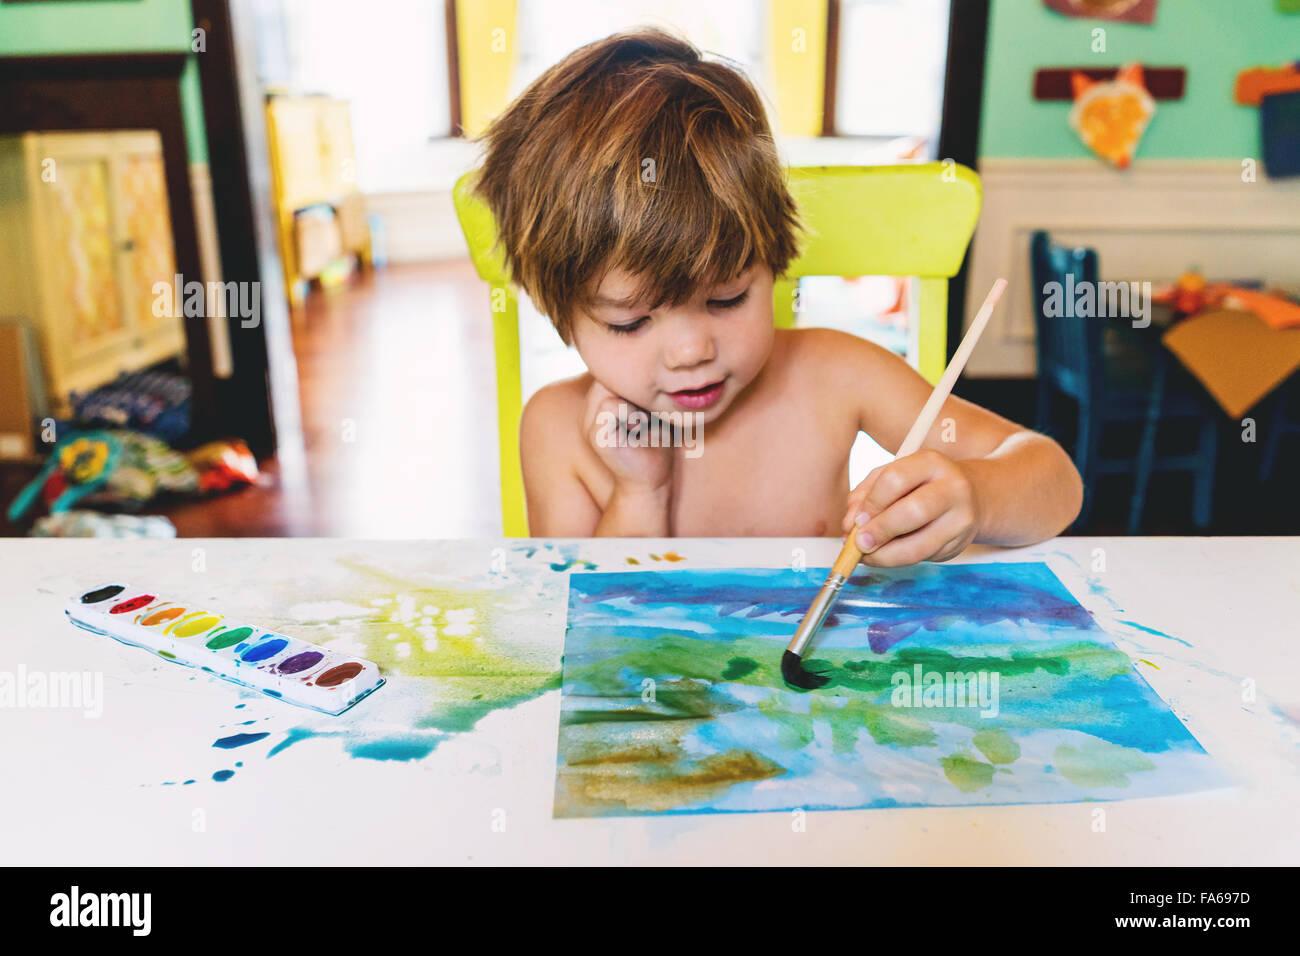 Boy pintar con acuarelas Imagen De Stock